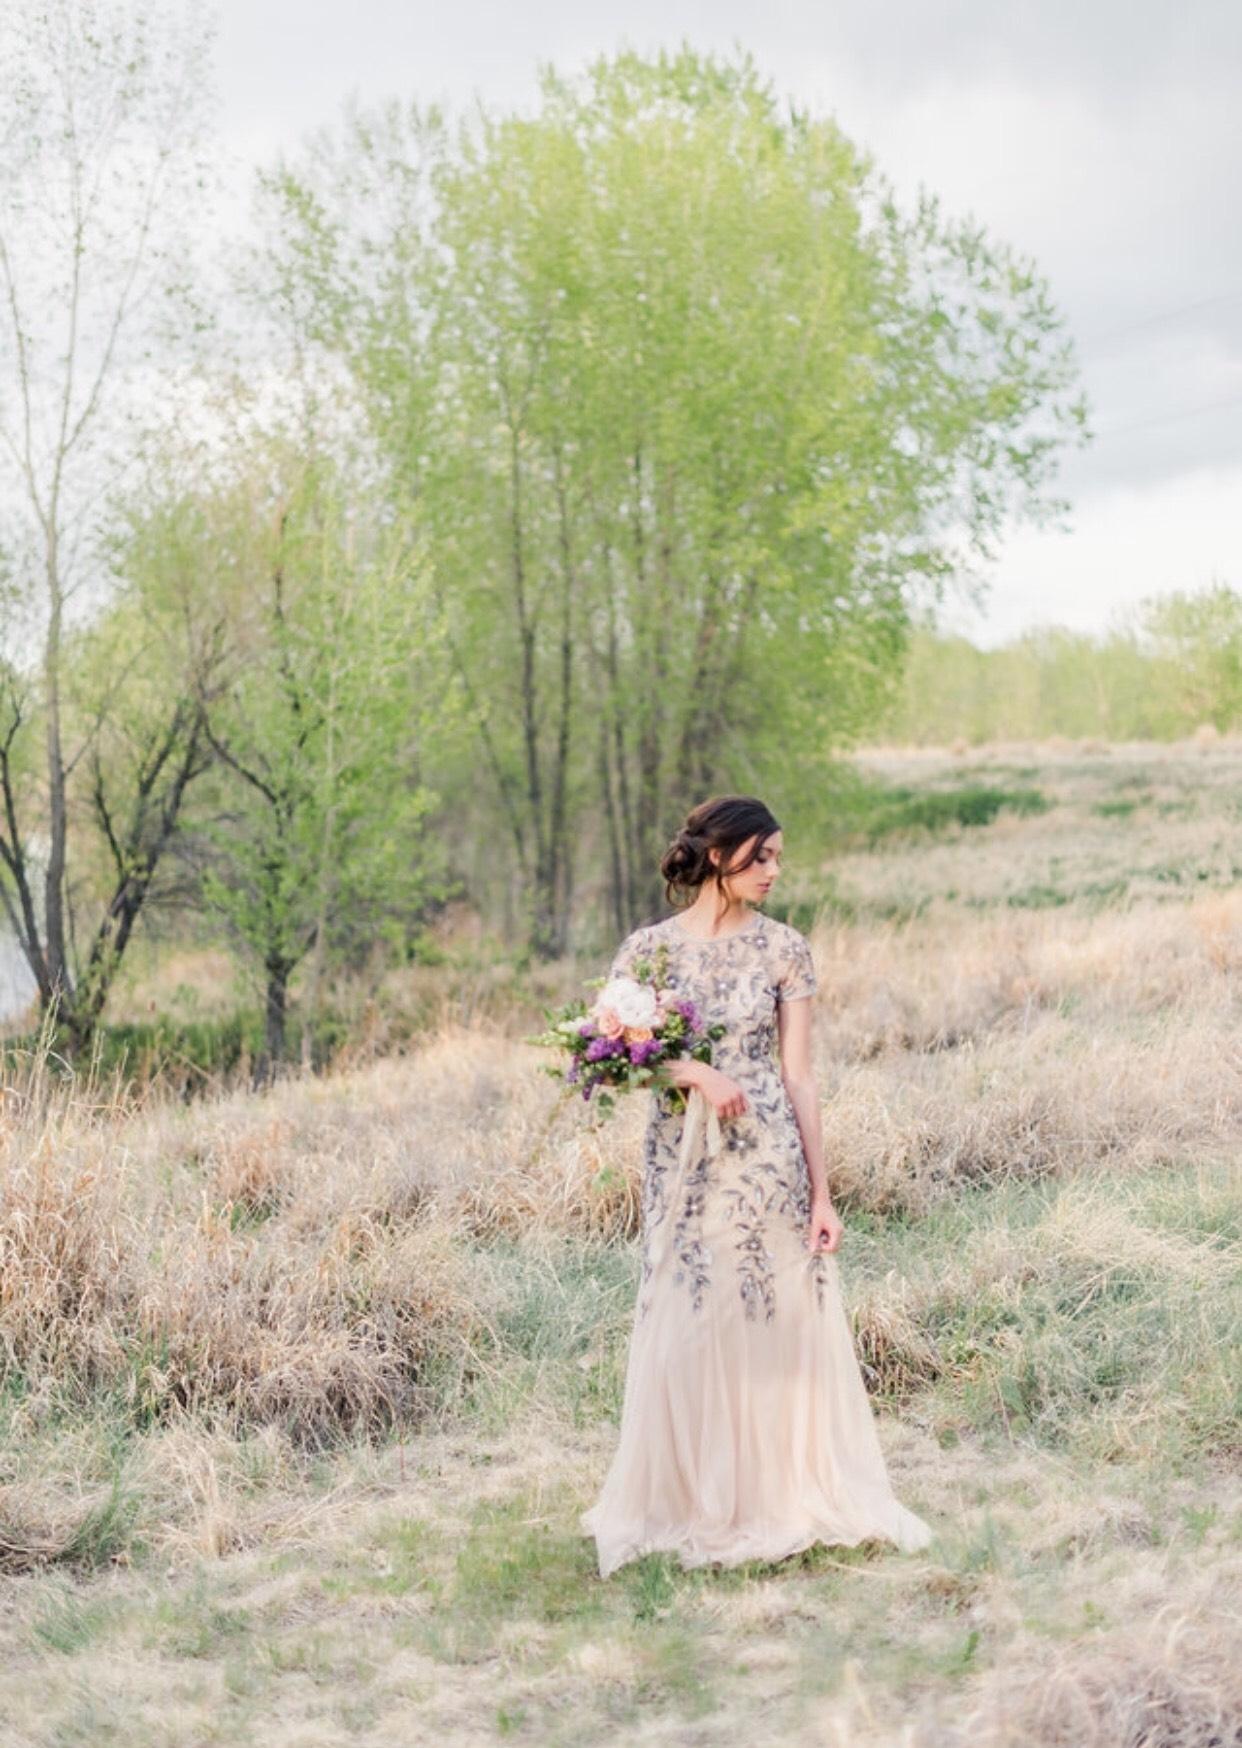 Denver-wedding-hairstylist-wedding-hair-messy-updo